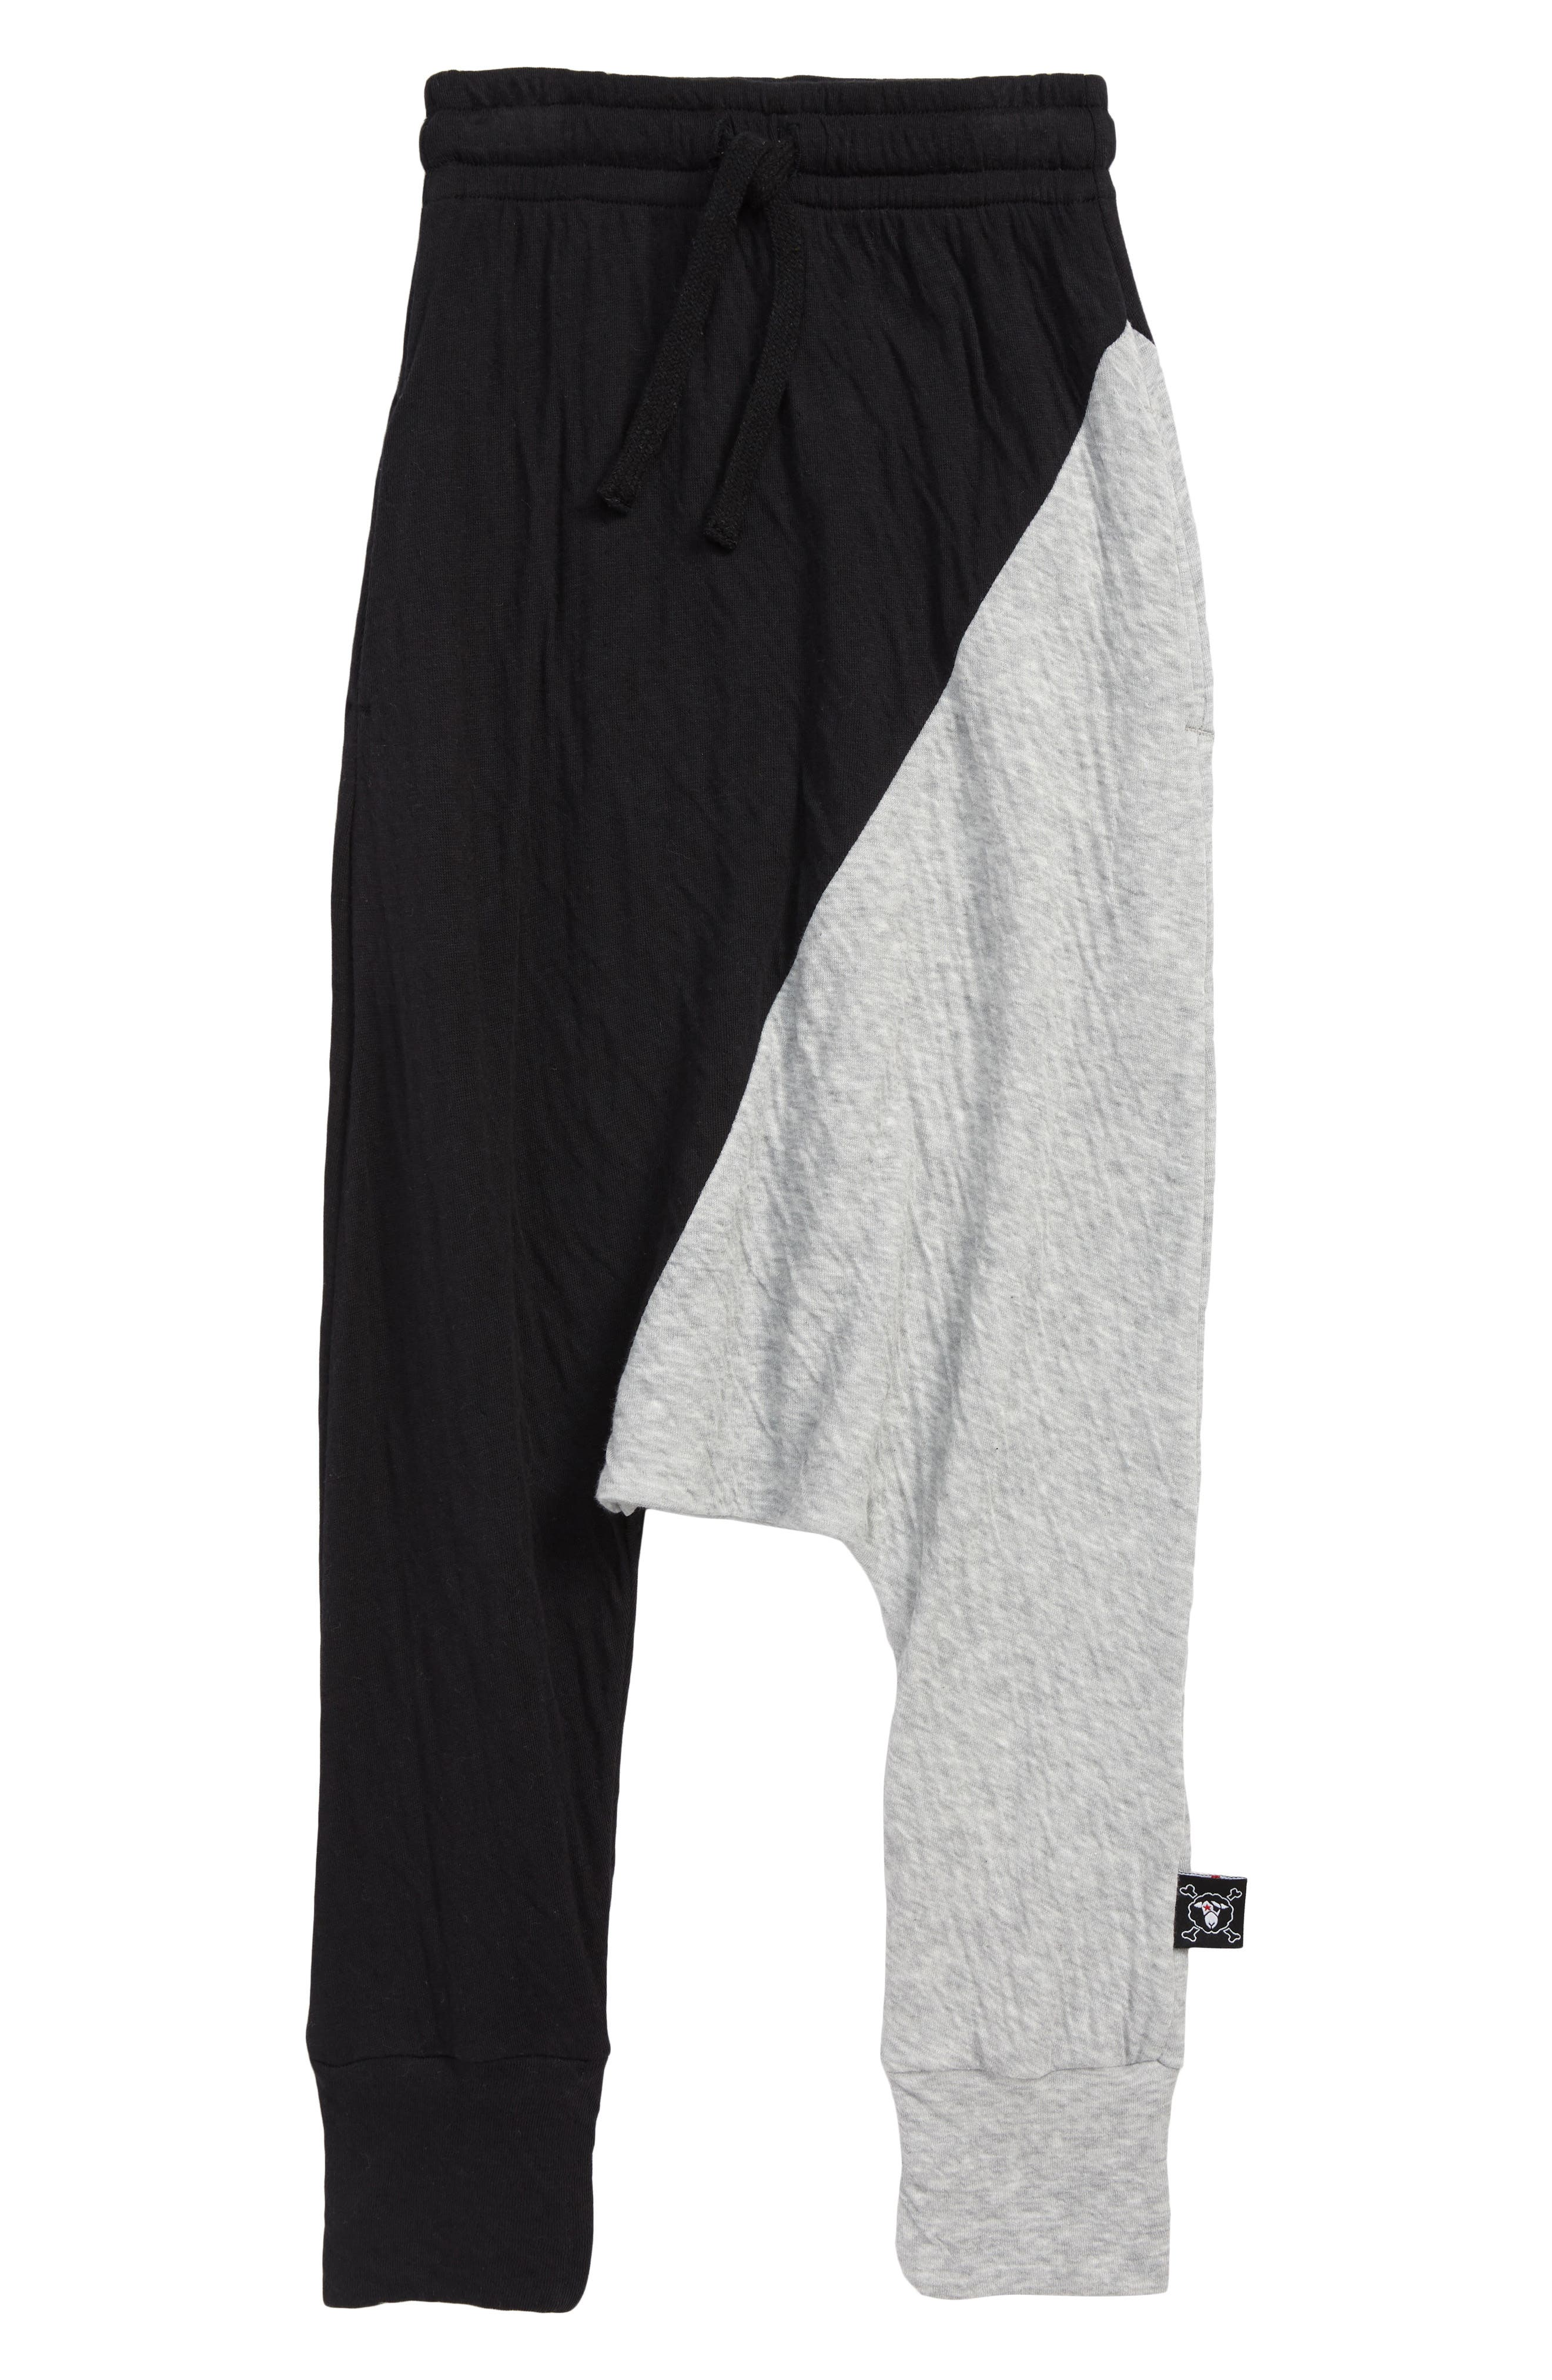 Colorblock Baggy Pants,                         Main,                         color, BLACK/ HEATHER GREY